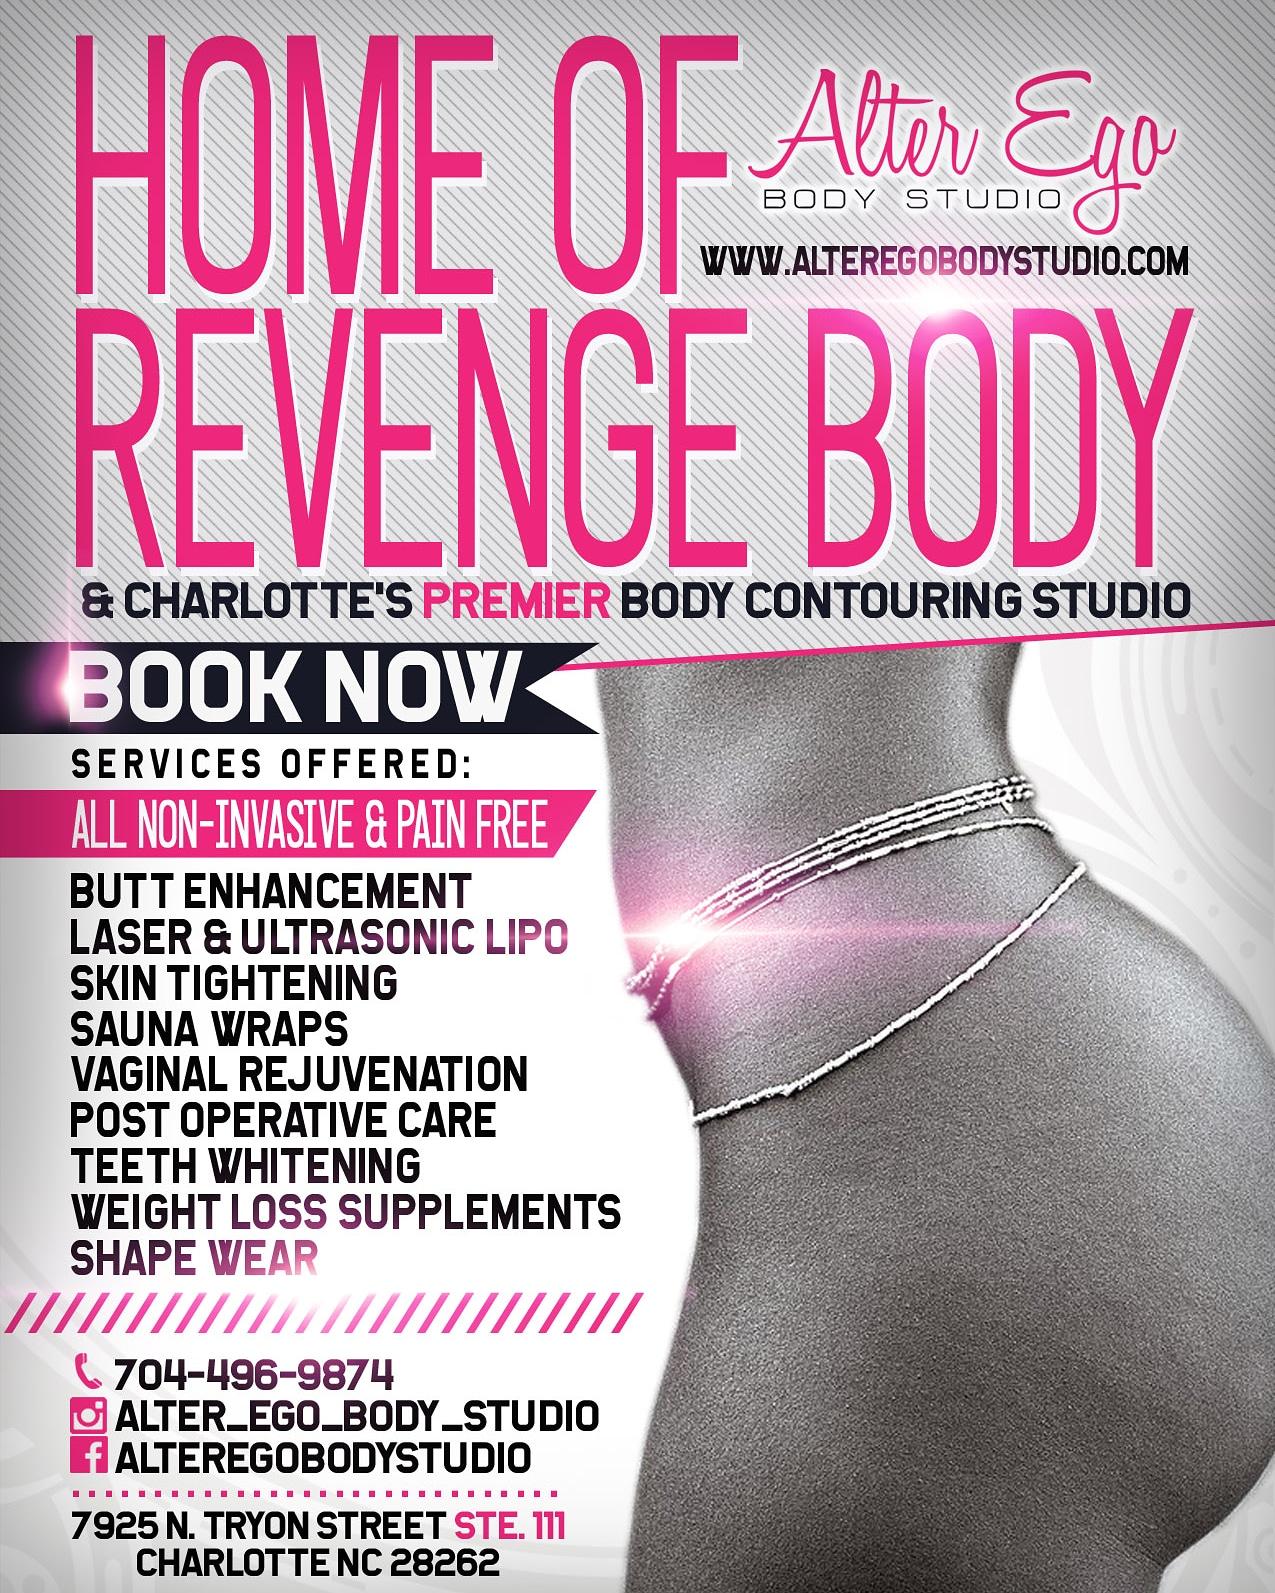 Alter Ego Body Studio